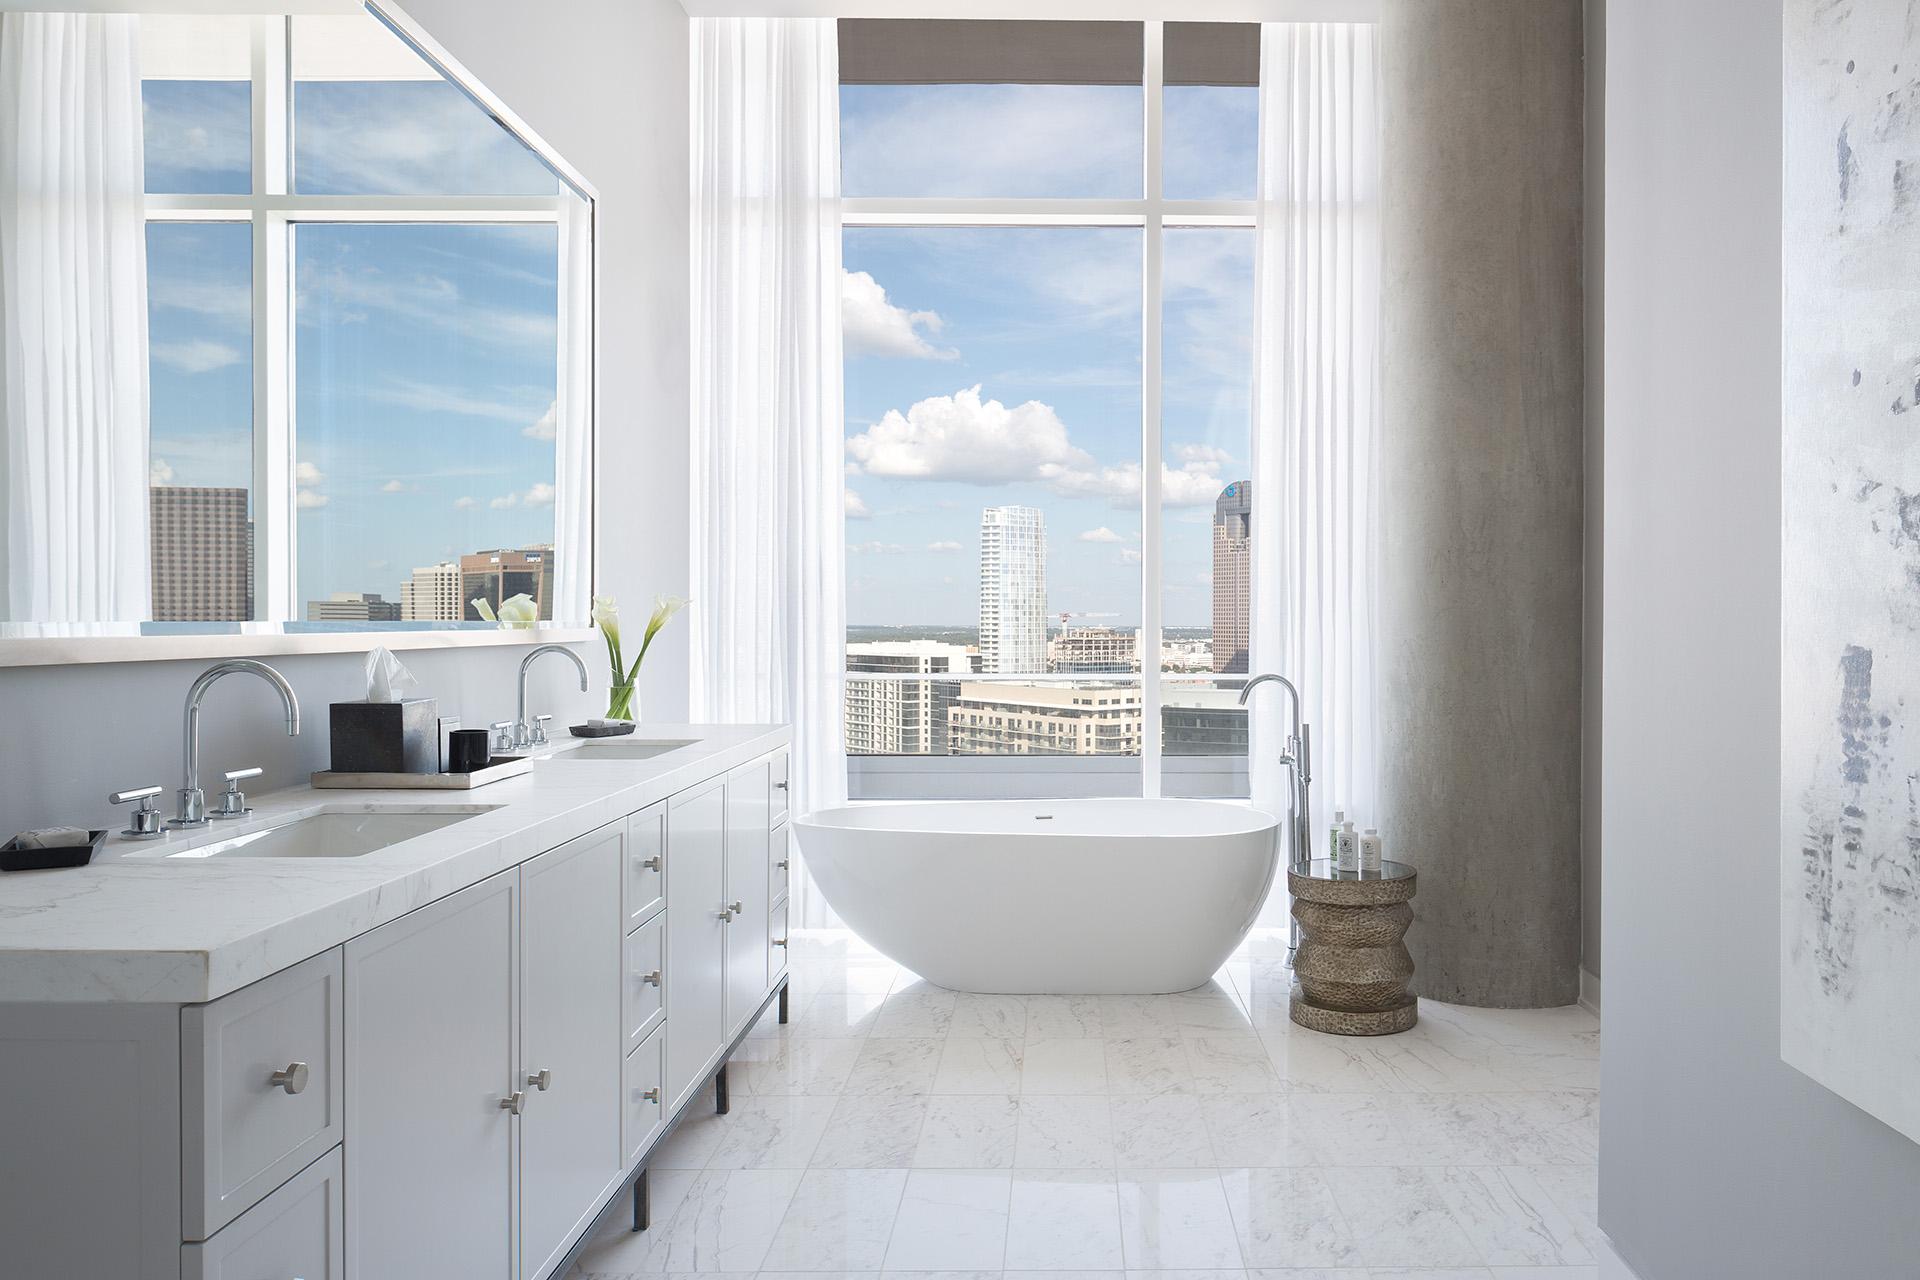 Bathroom - Platinum Homes by Mark Molthan